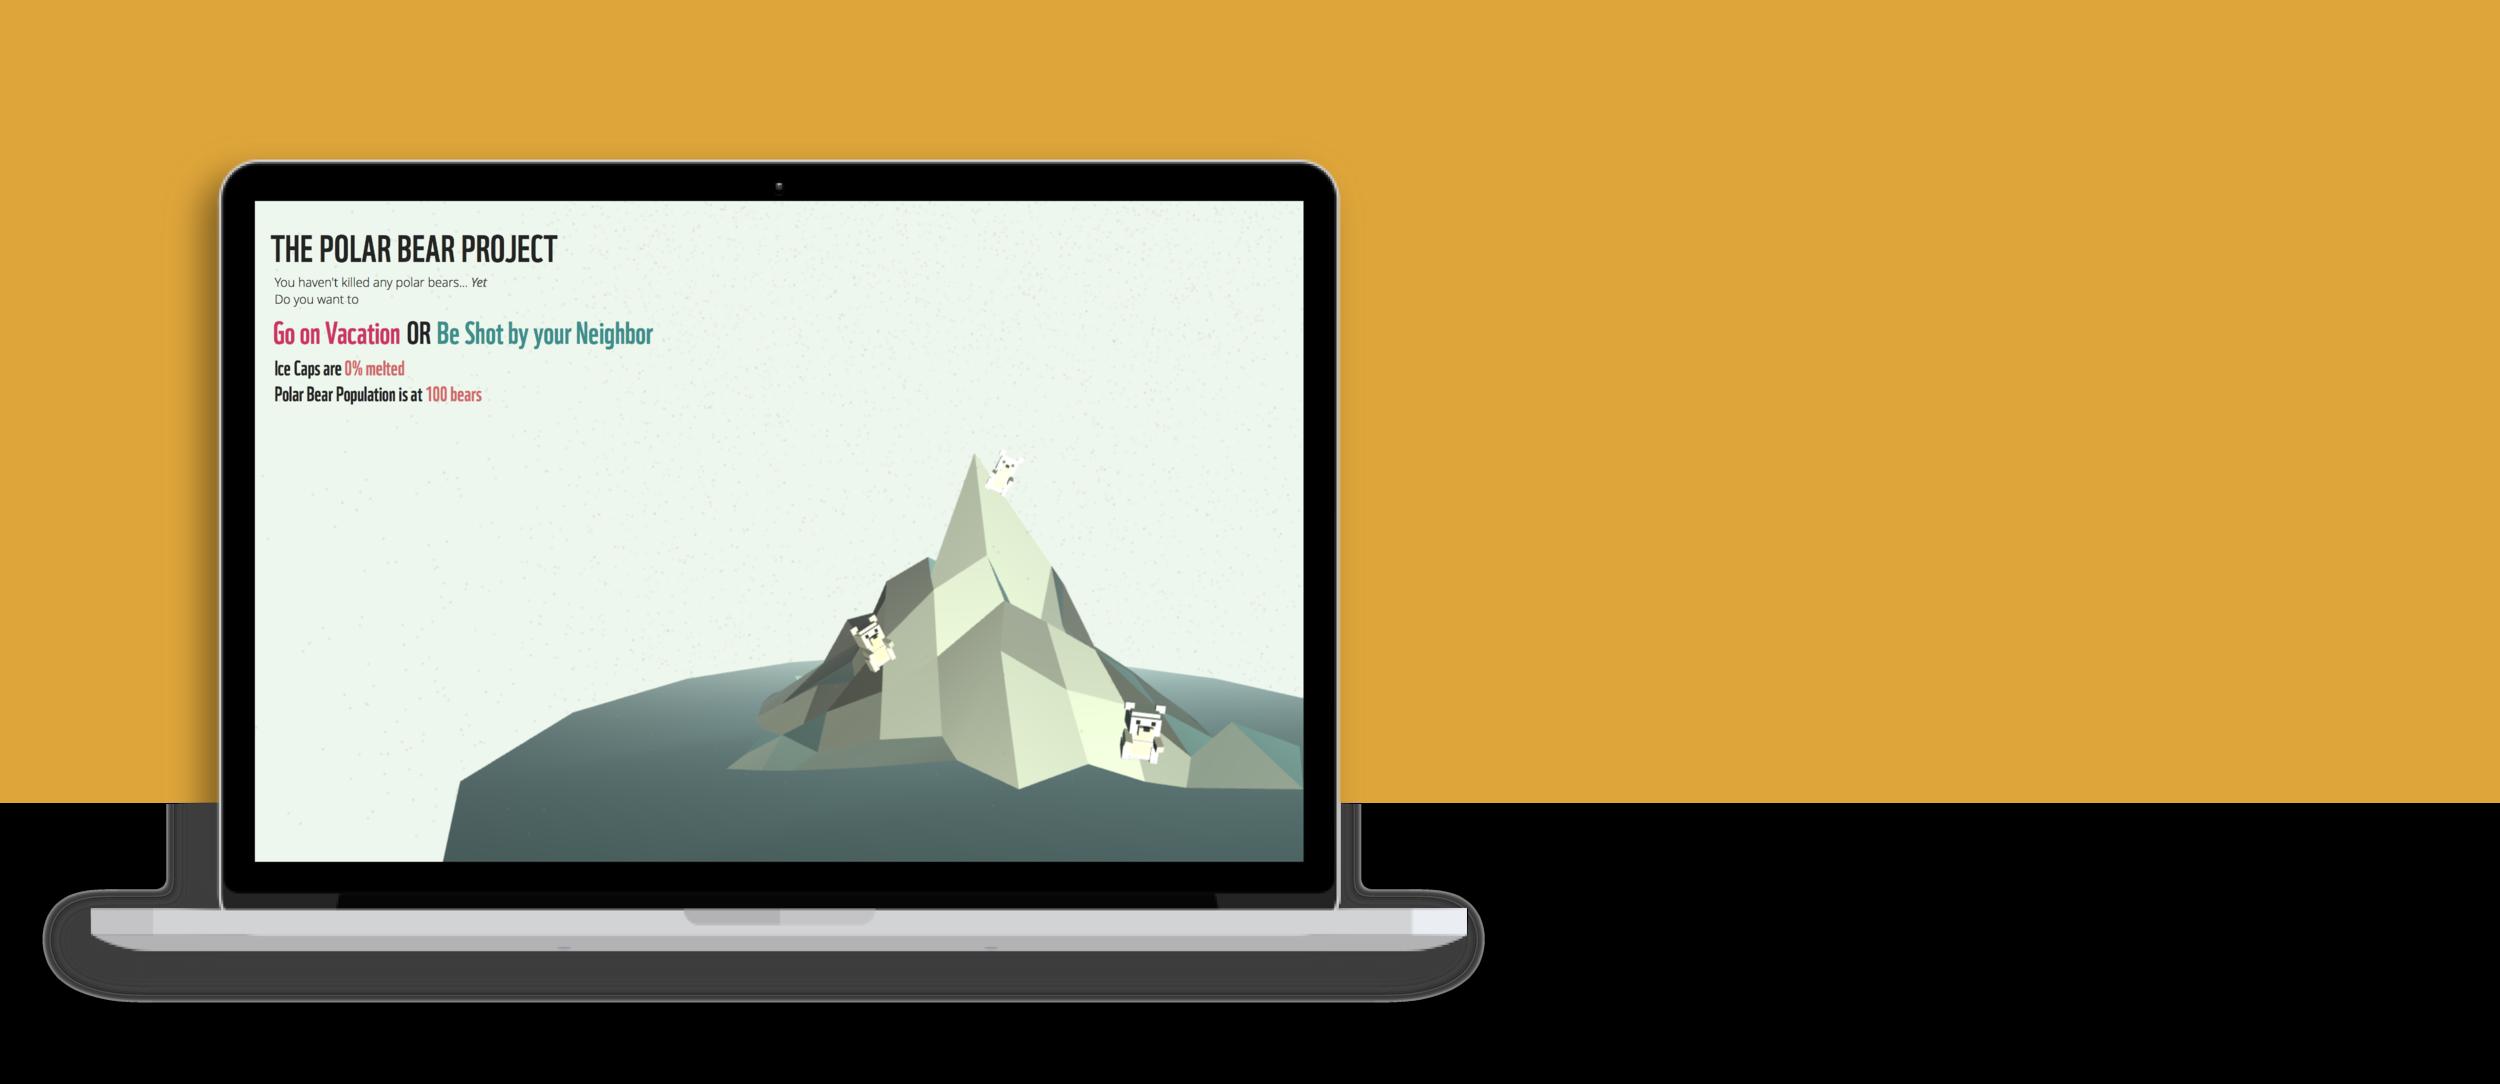 The Polar Bear Project - Web Development, 3D Model, Social Change